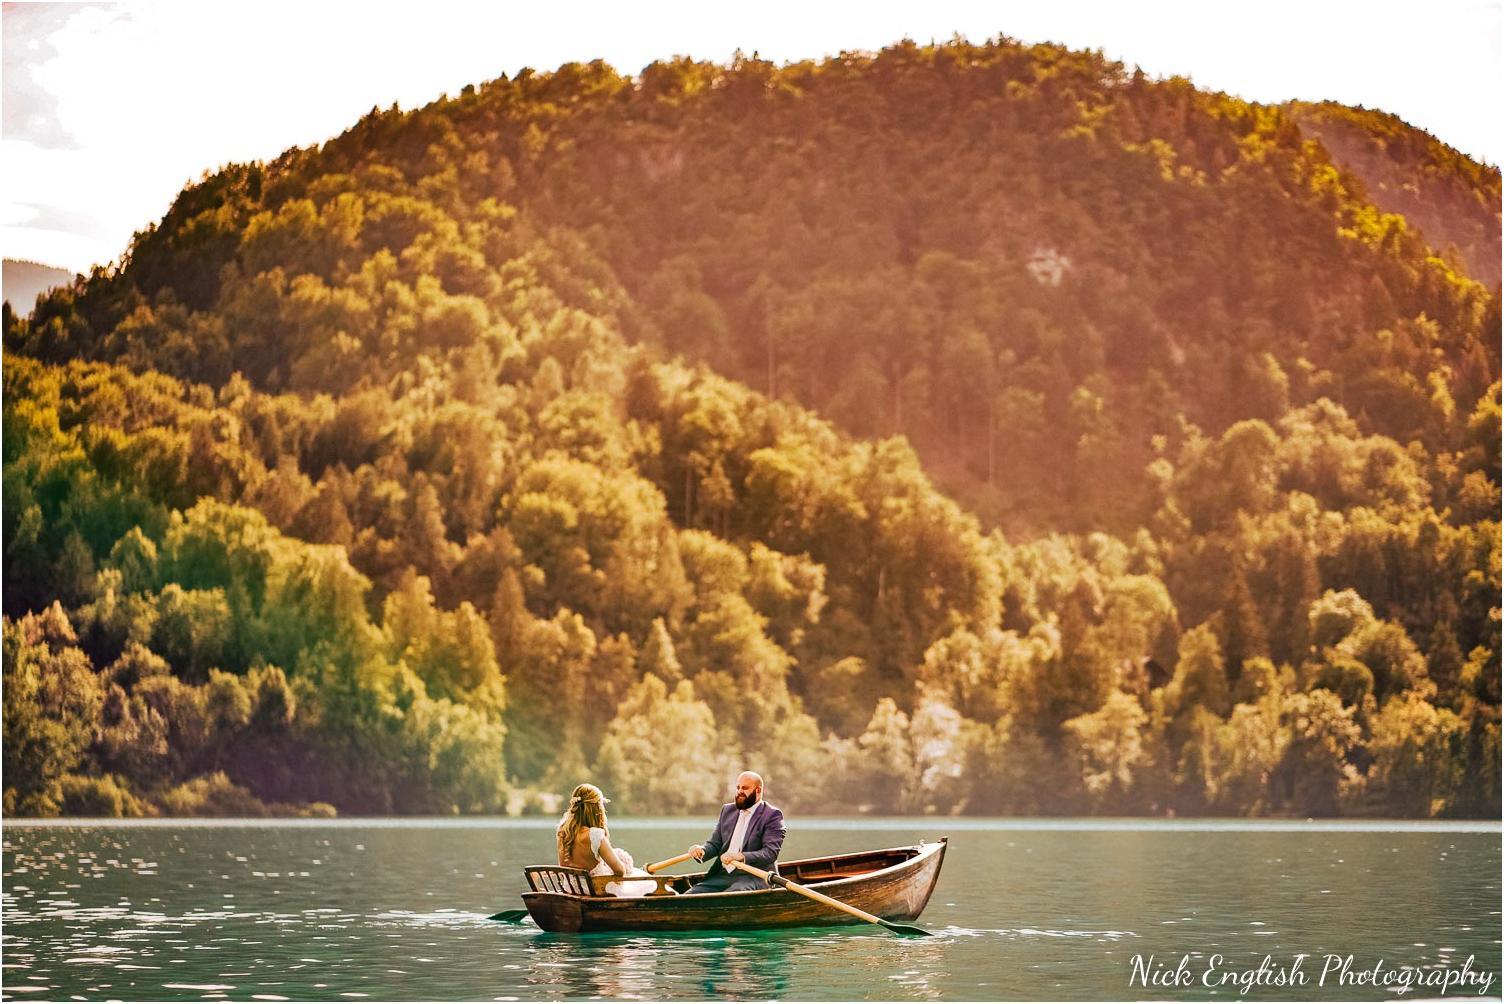 Destination_Wedding_Photographer_Slovenia_Nick_English_Photography-70-4.jpg